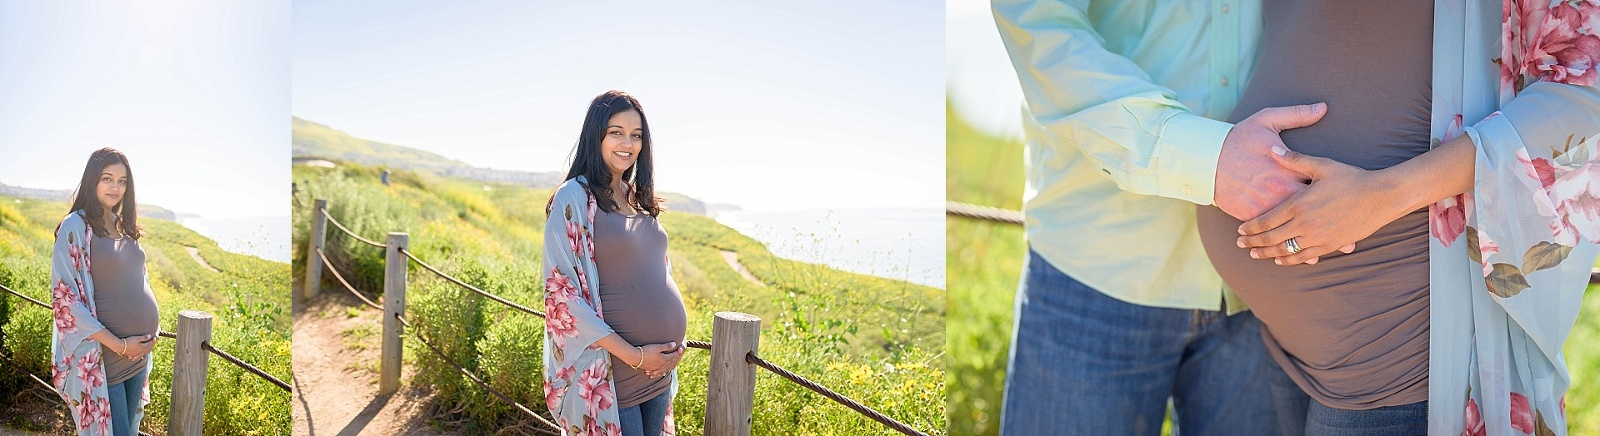 kimono over shirt for maternity photos